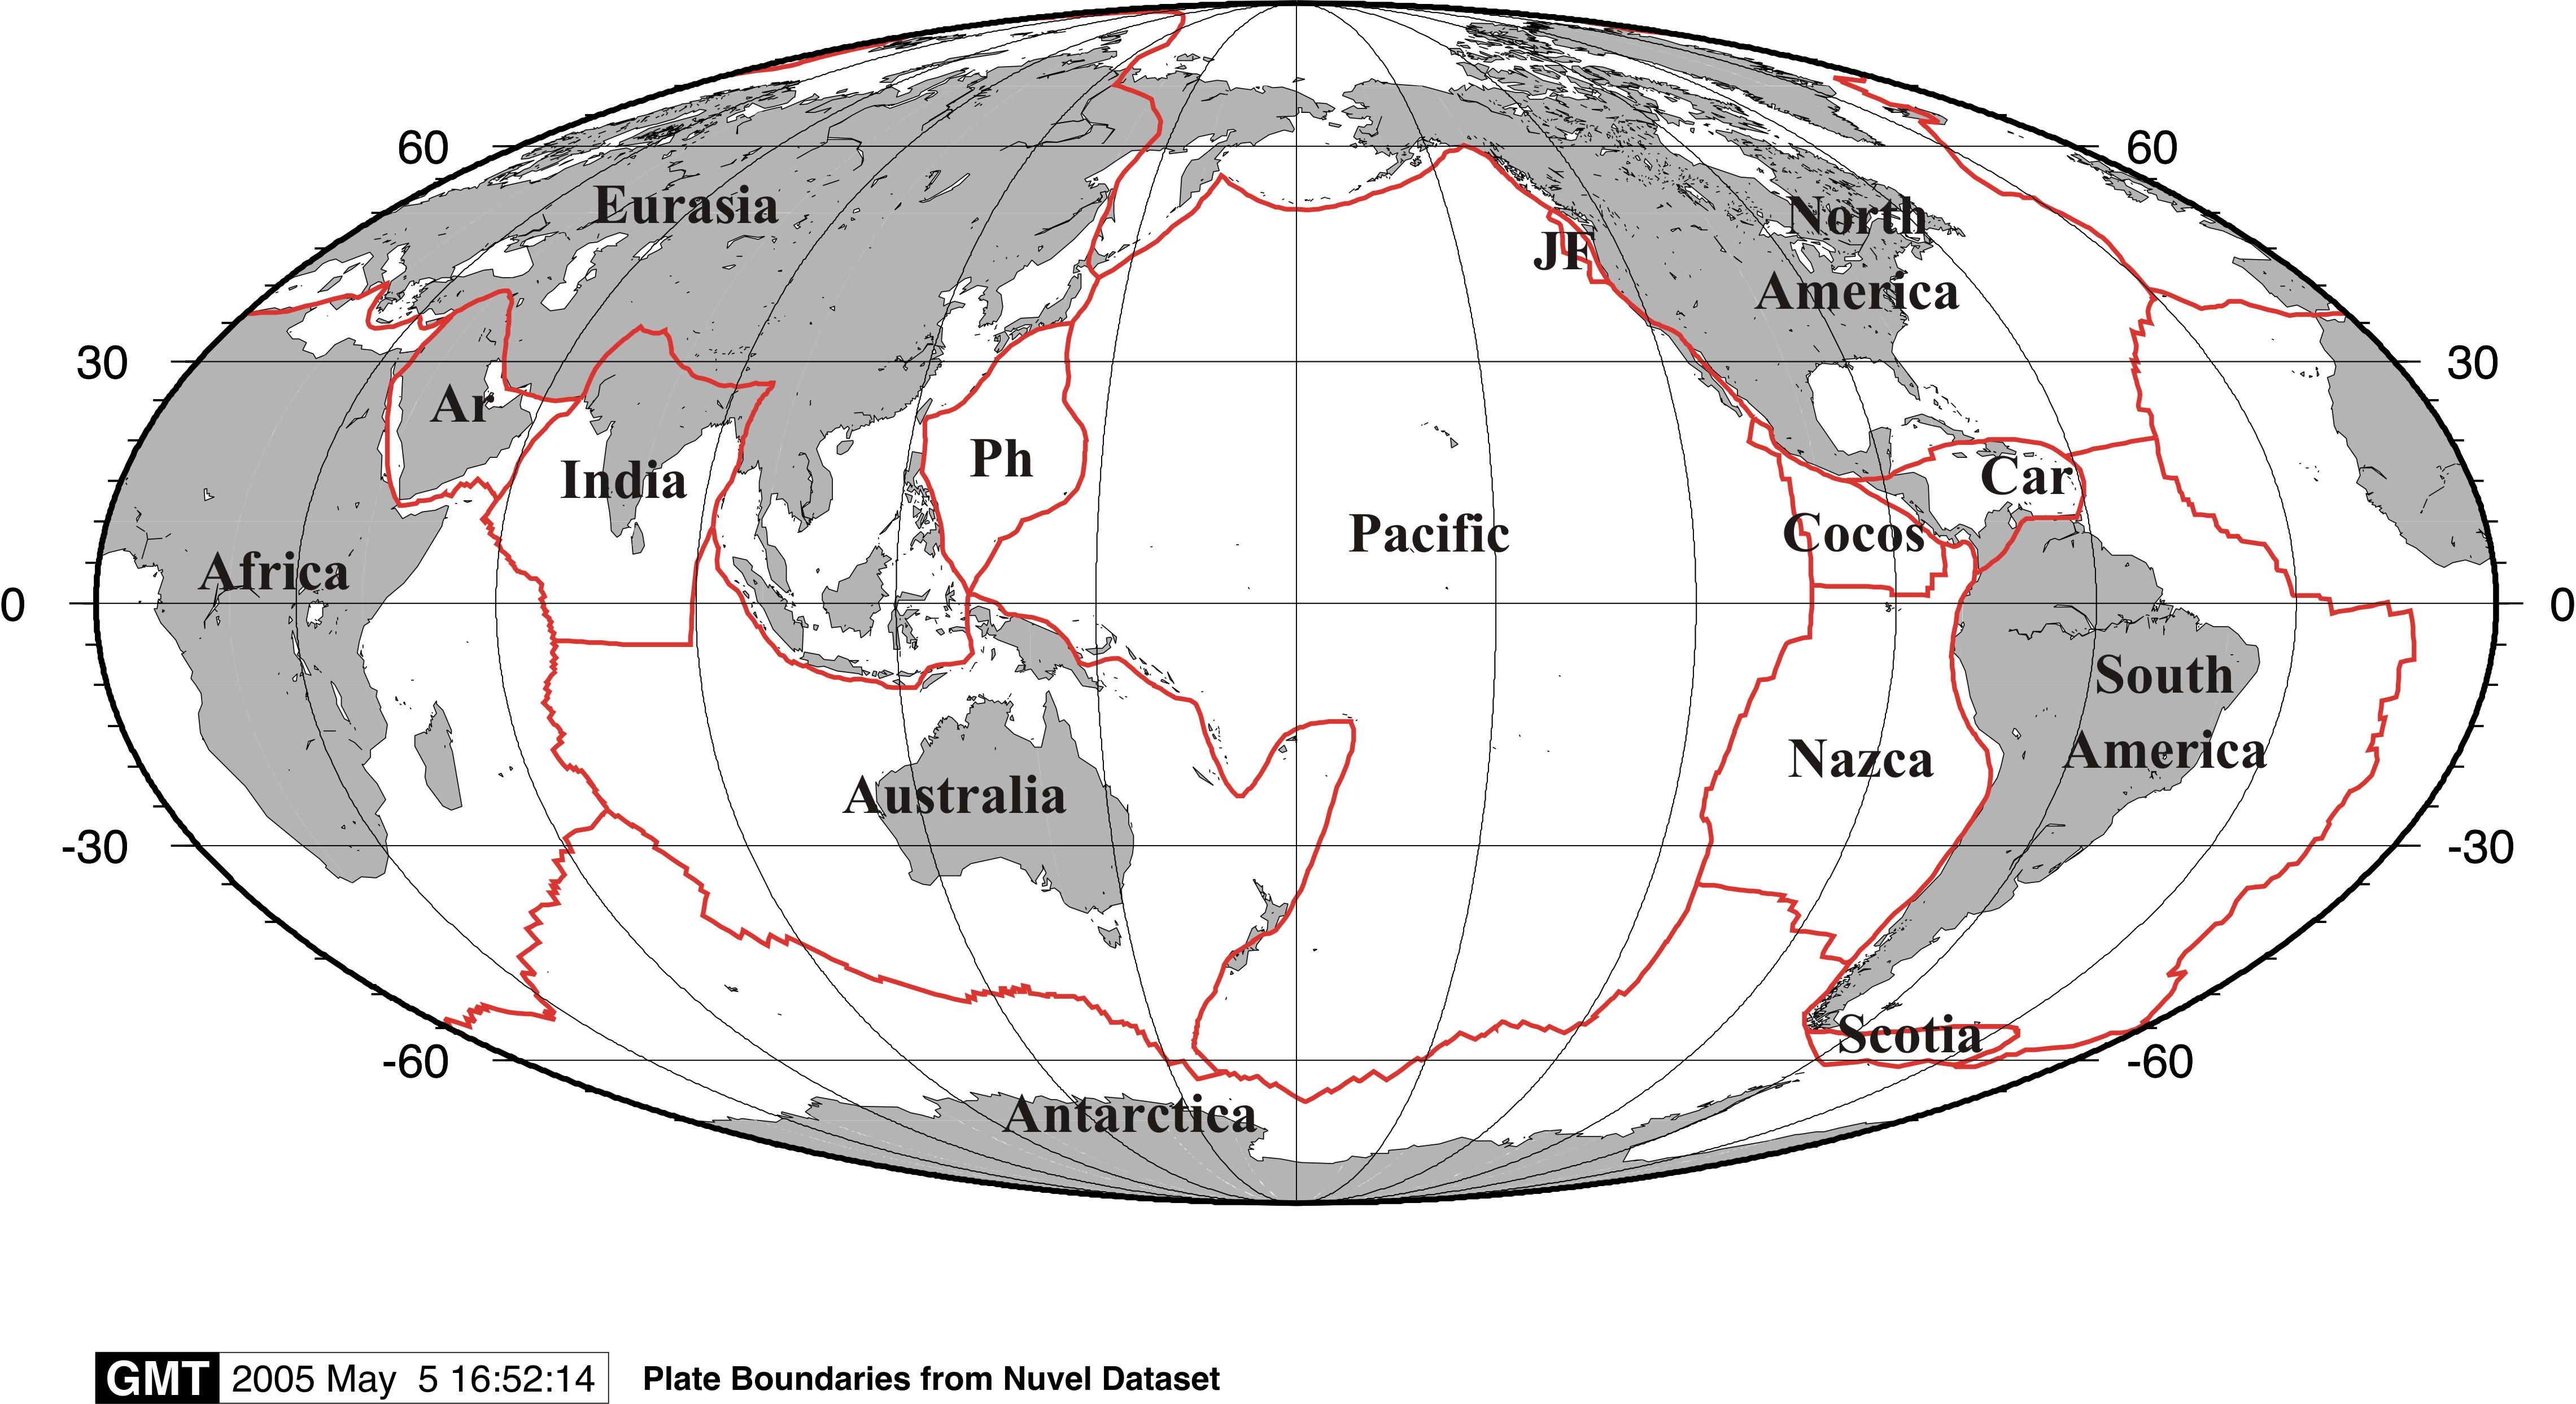 EarthByte - Map of us plate boundaries